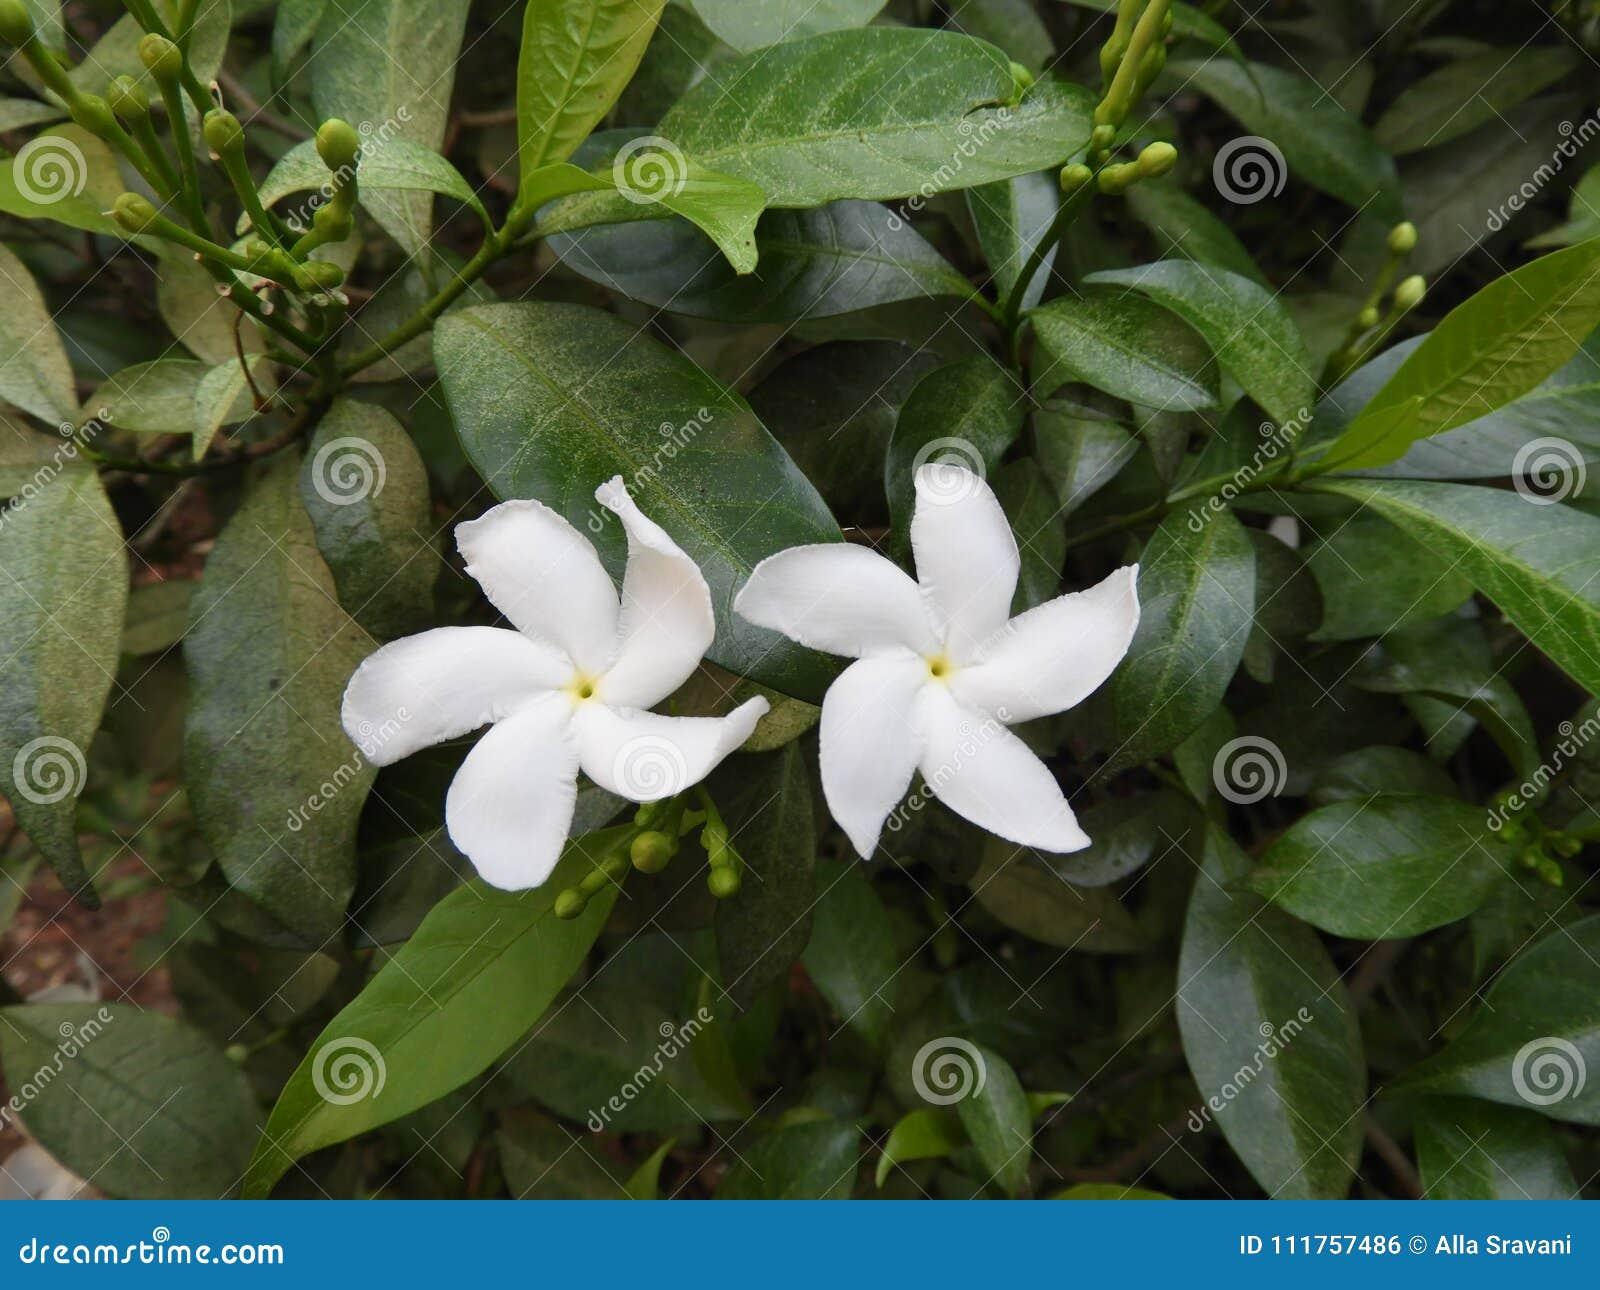 Pin wheel flower or crape jasmine stock photo image of beautiful download pin wheel flower or crape jasmine stock photo image of beautiful best izmirmasajfo